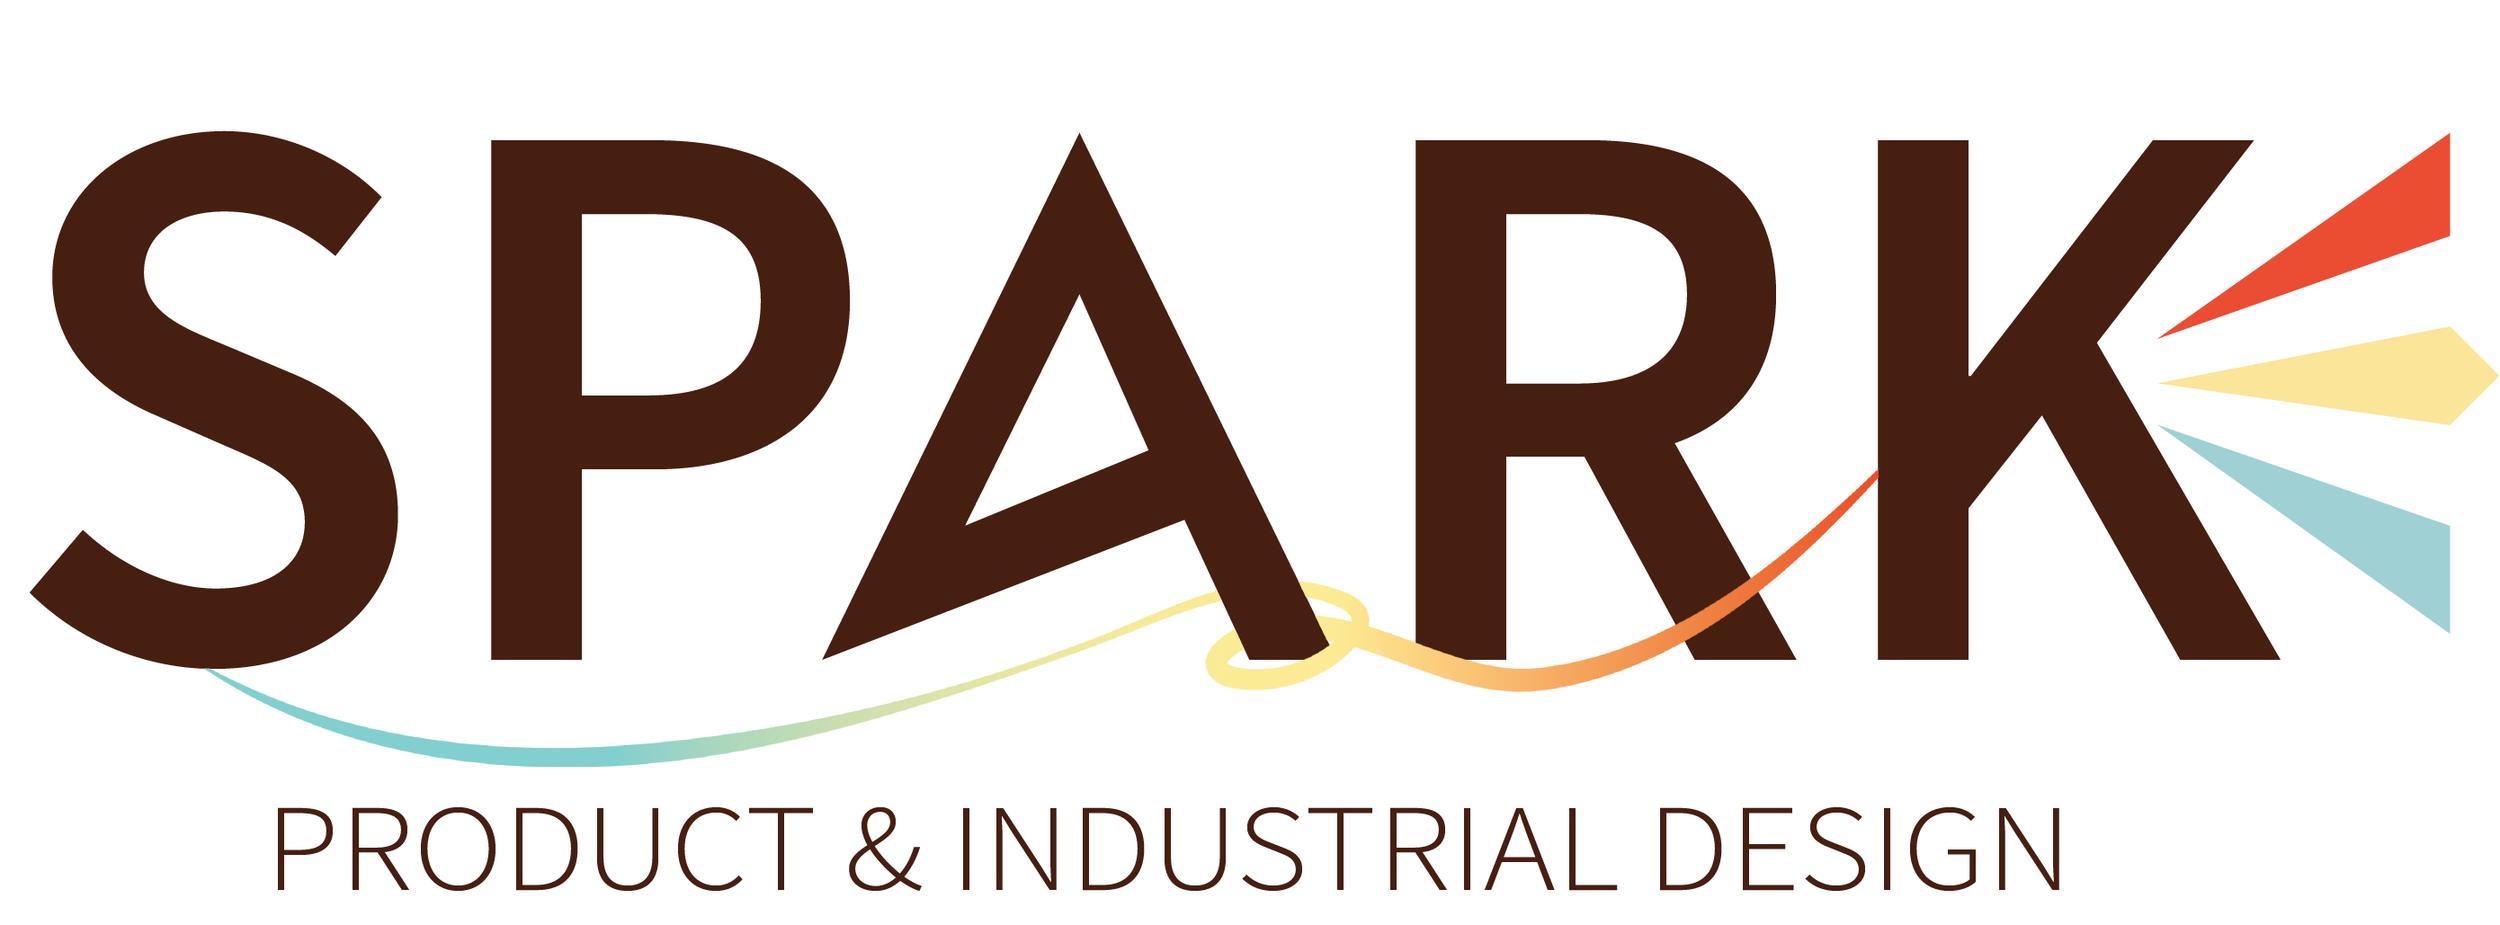 Spark logo new.png